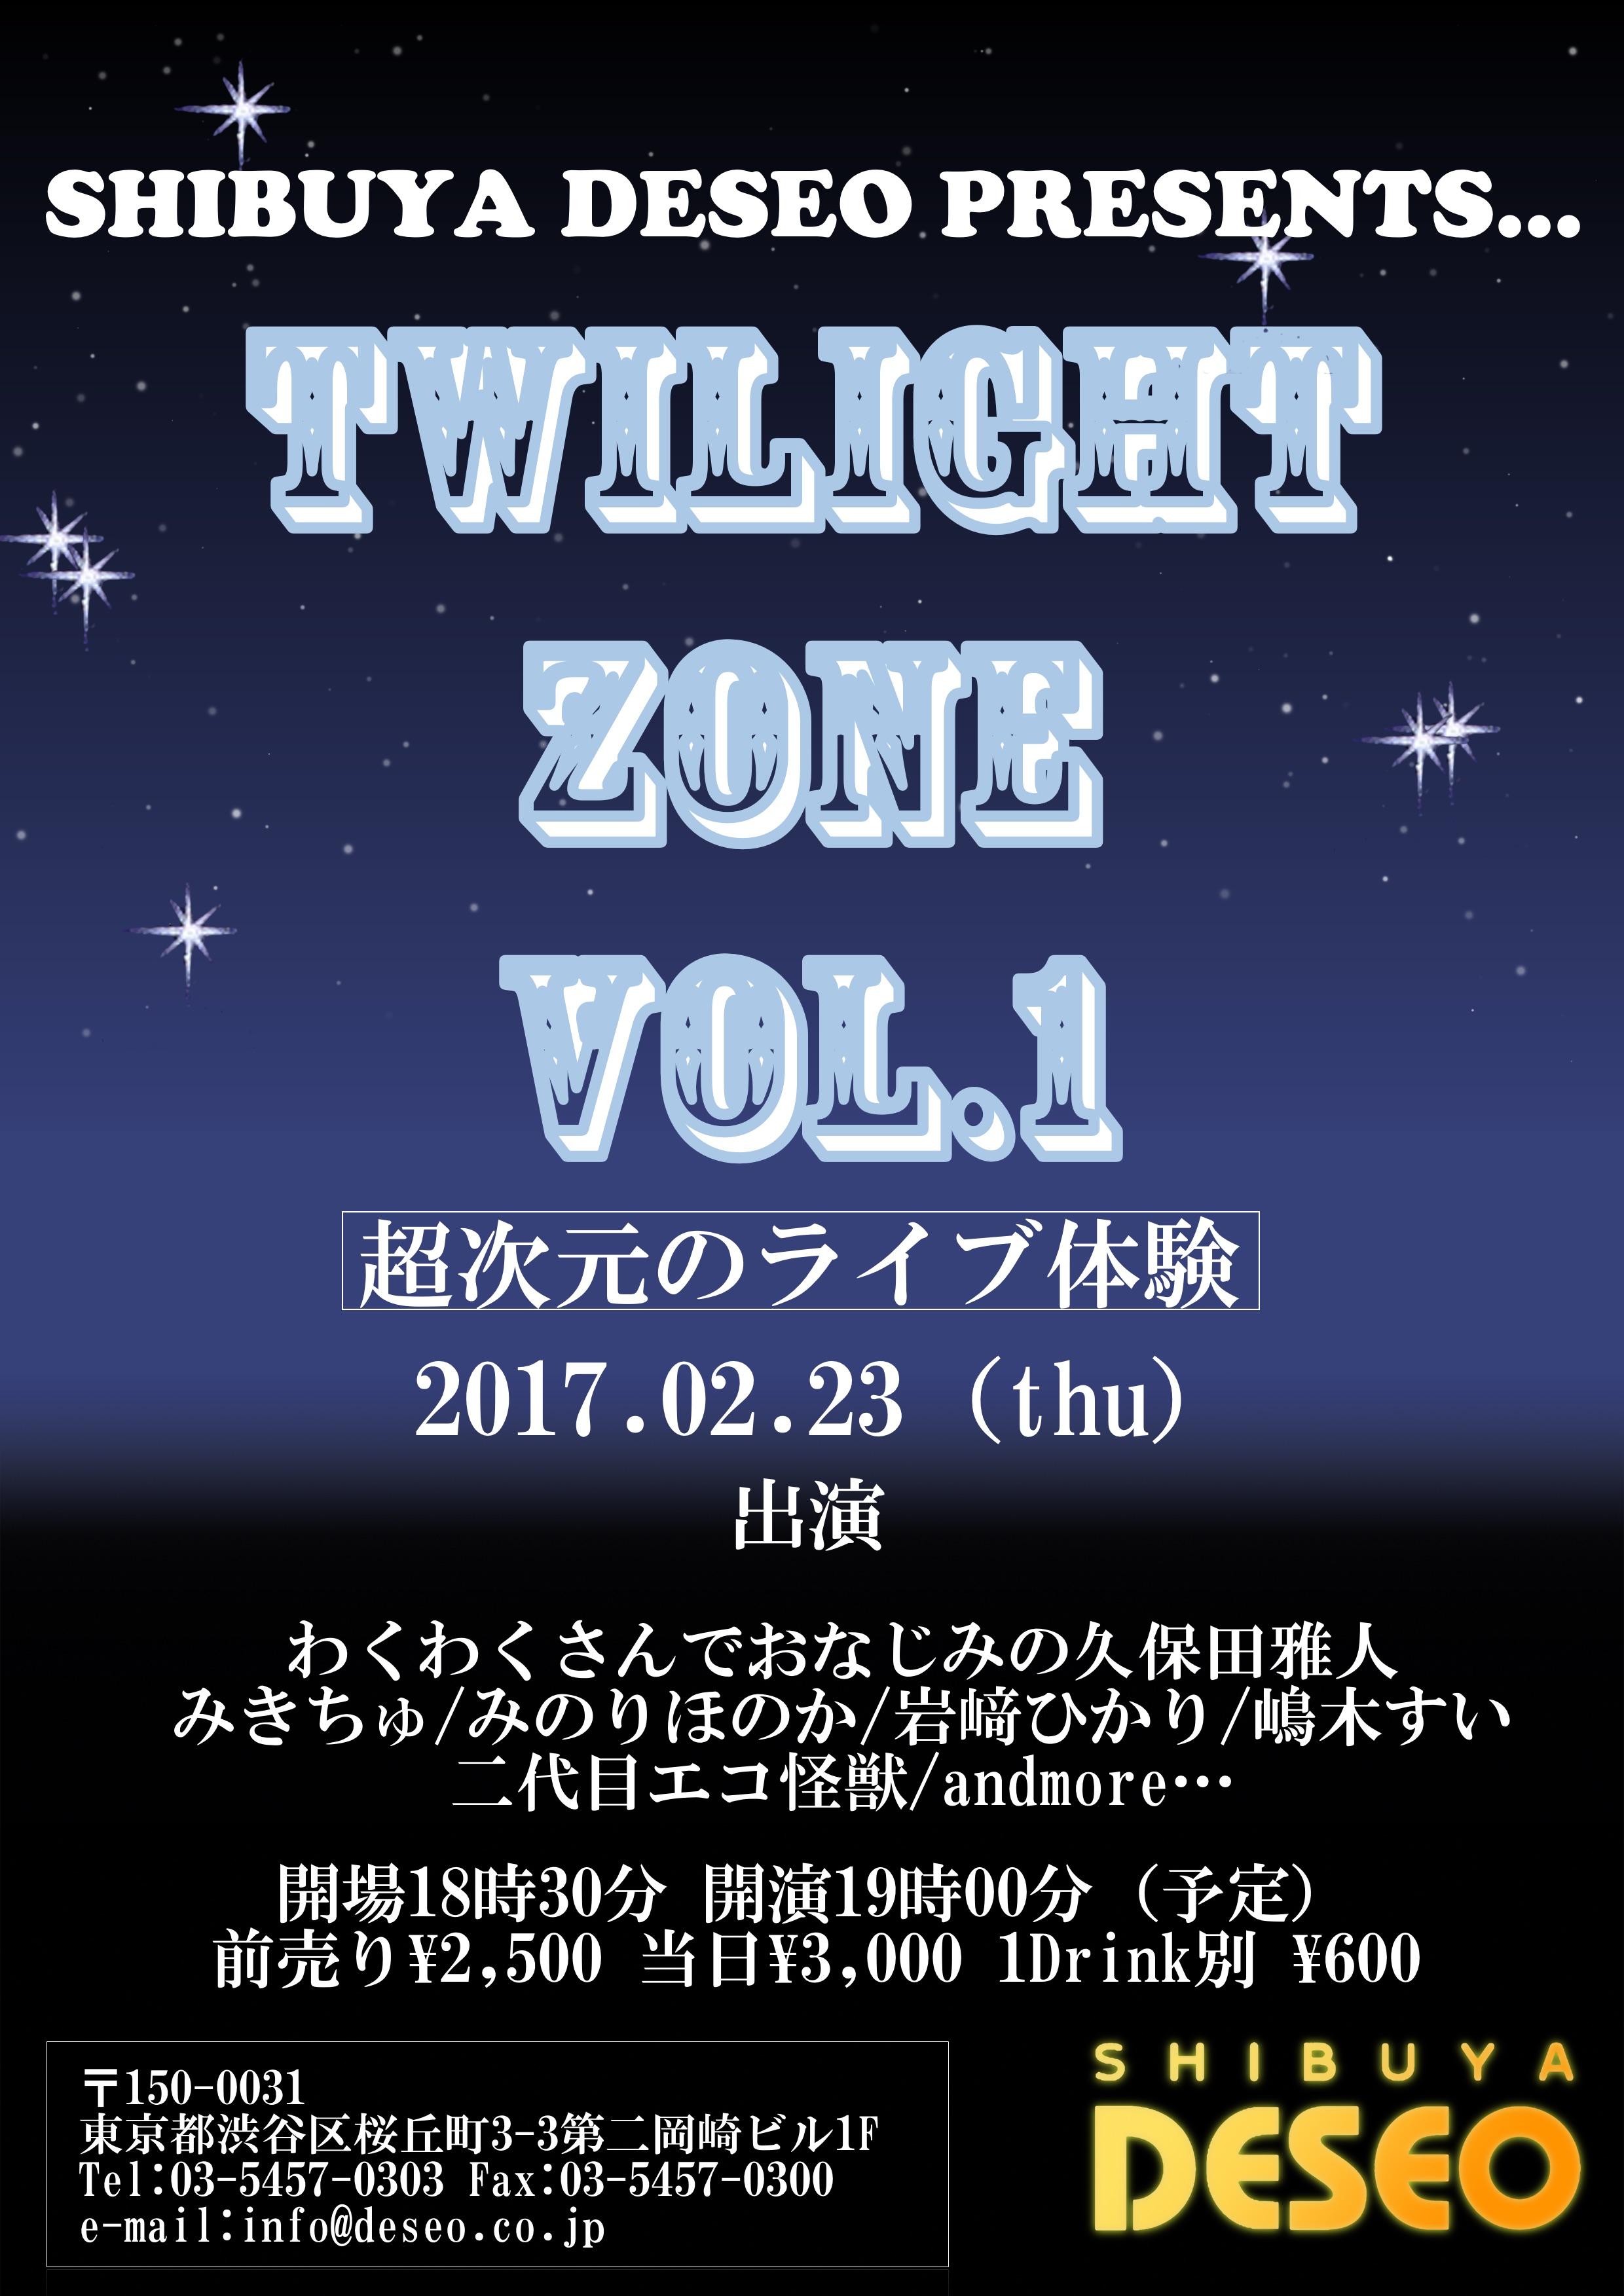 SHIBUYA DESEO PRESENTS『TWILIGHT ZONE Vol.1』